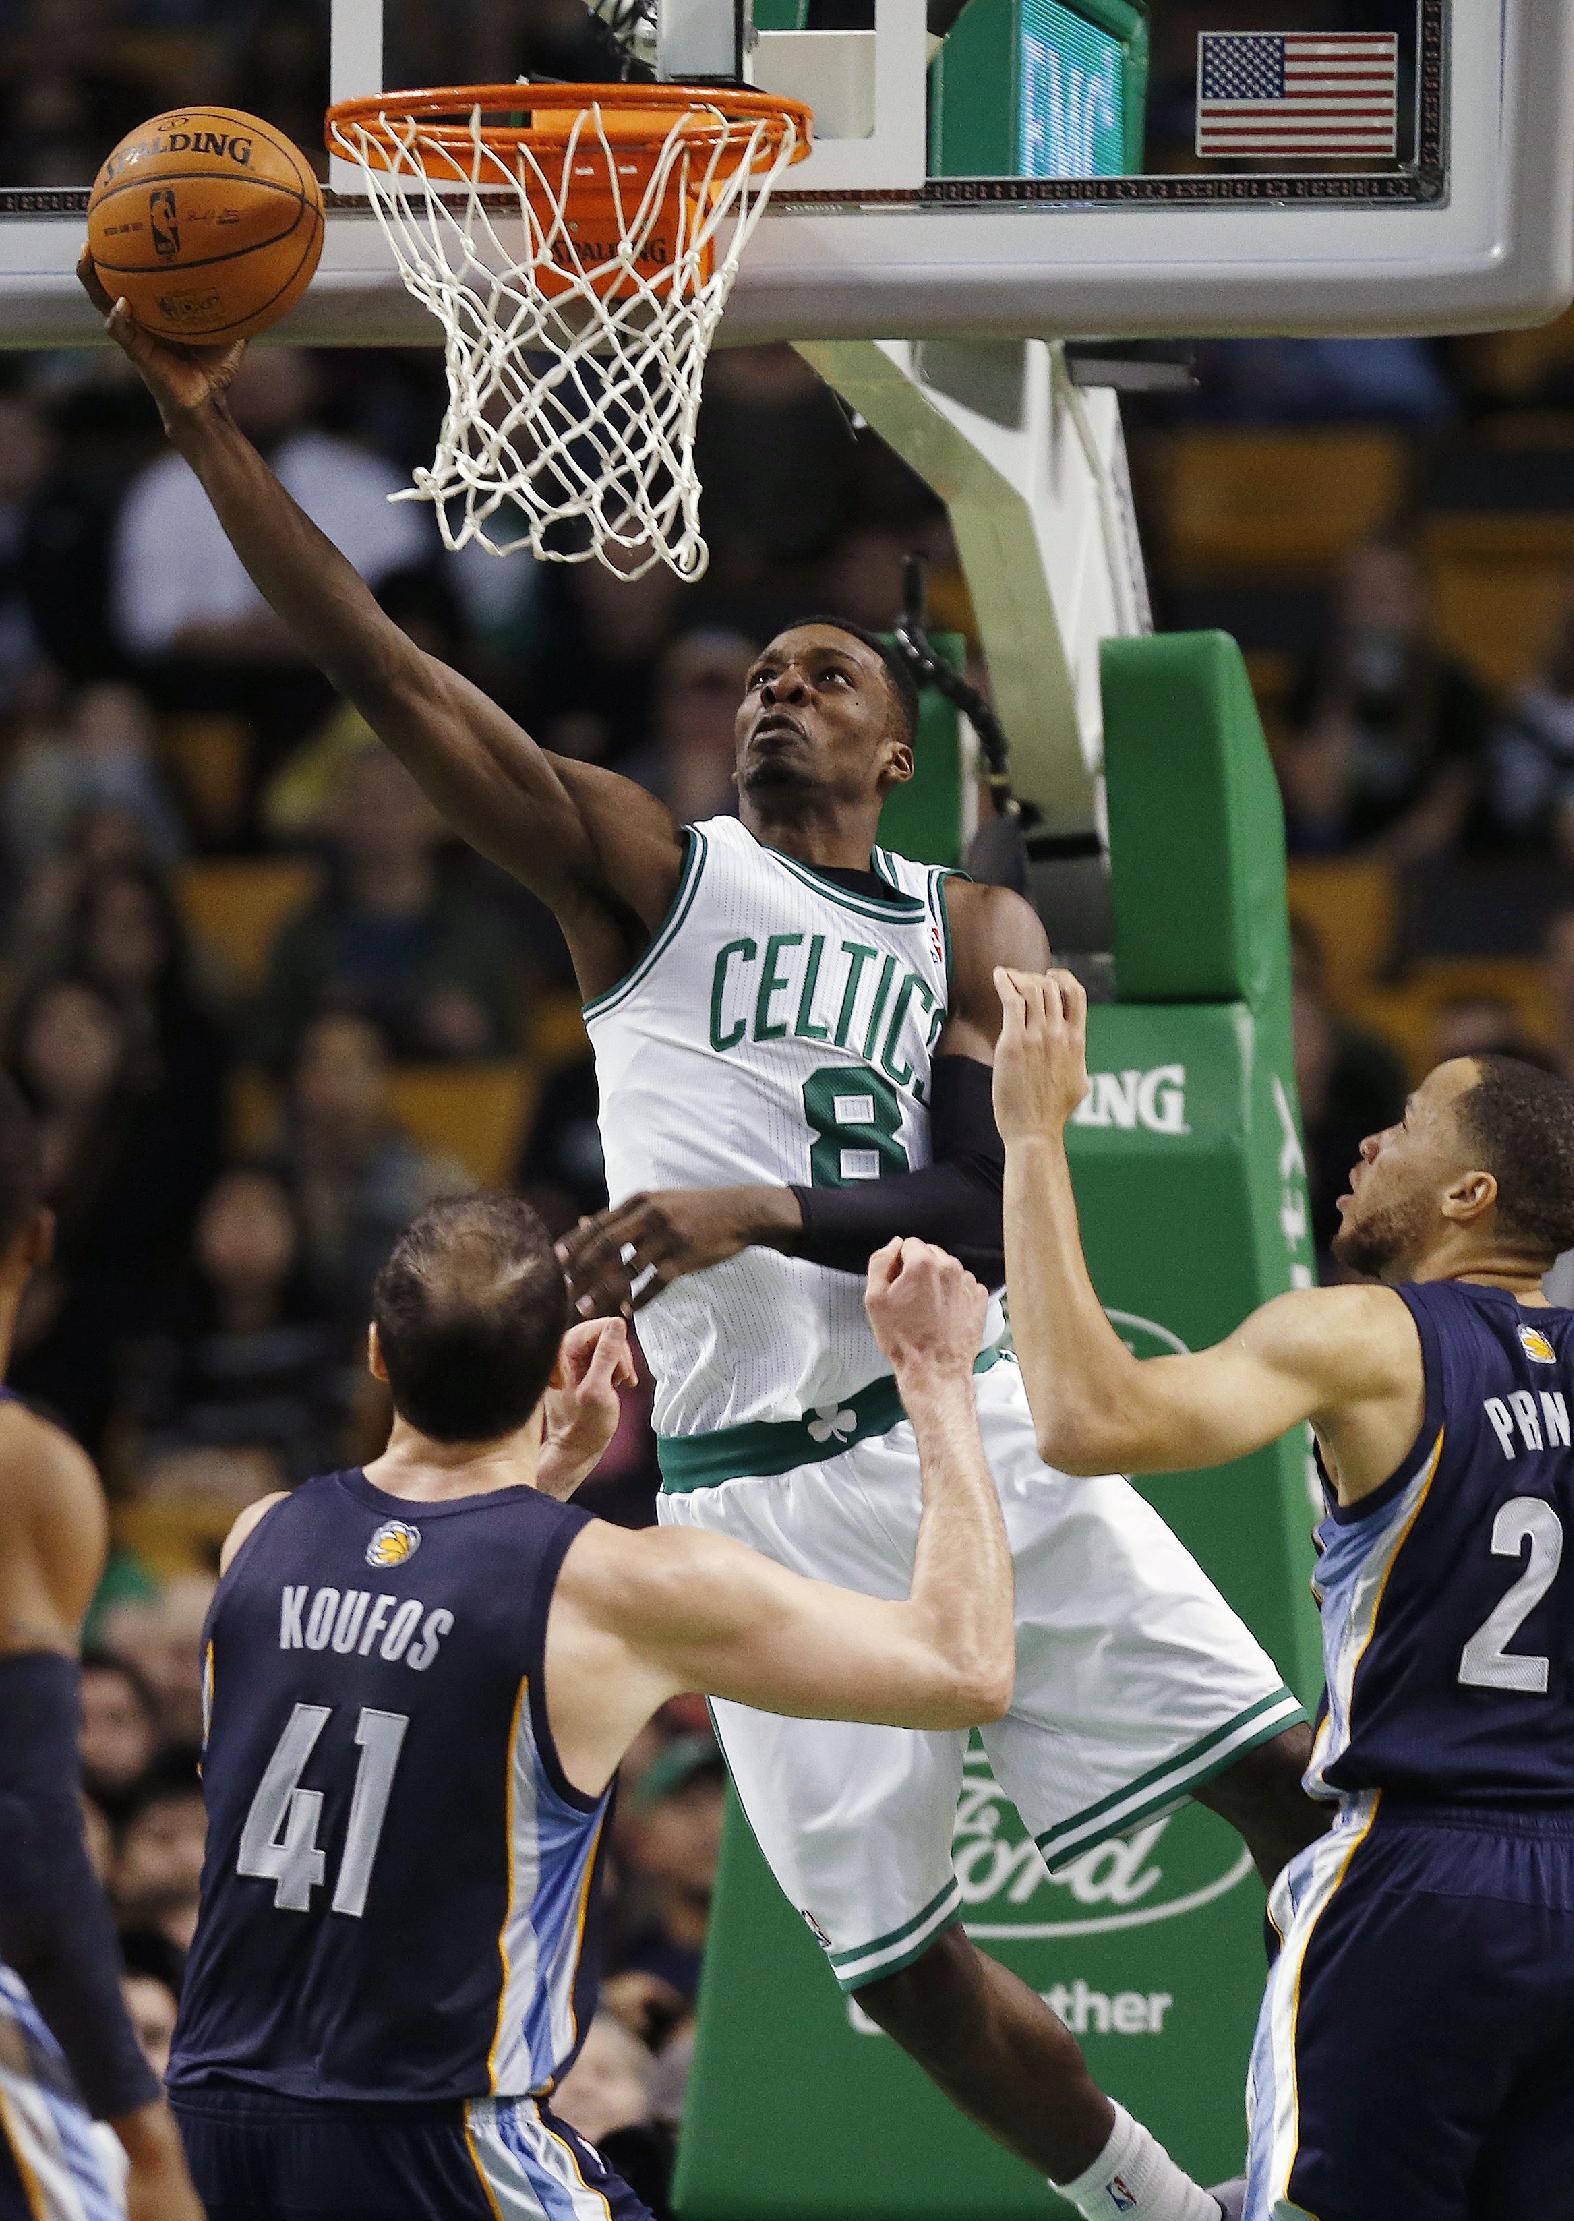 Boston Celtics' Jeff Green (8) shoots between Memphis Grizzlies' Kosta Koufos (41) and Tayshaun Prince (21) in the fourth quarter of an NBA basketball game in Boston, Wednesday, Nov. 27, 2013. The Grizzlies won 100-93